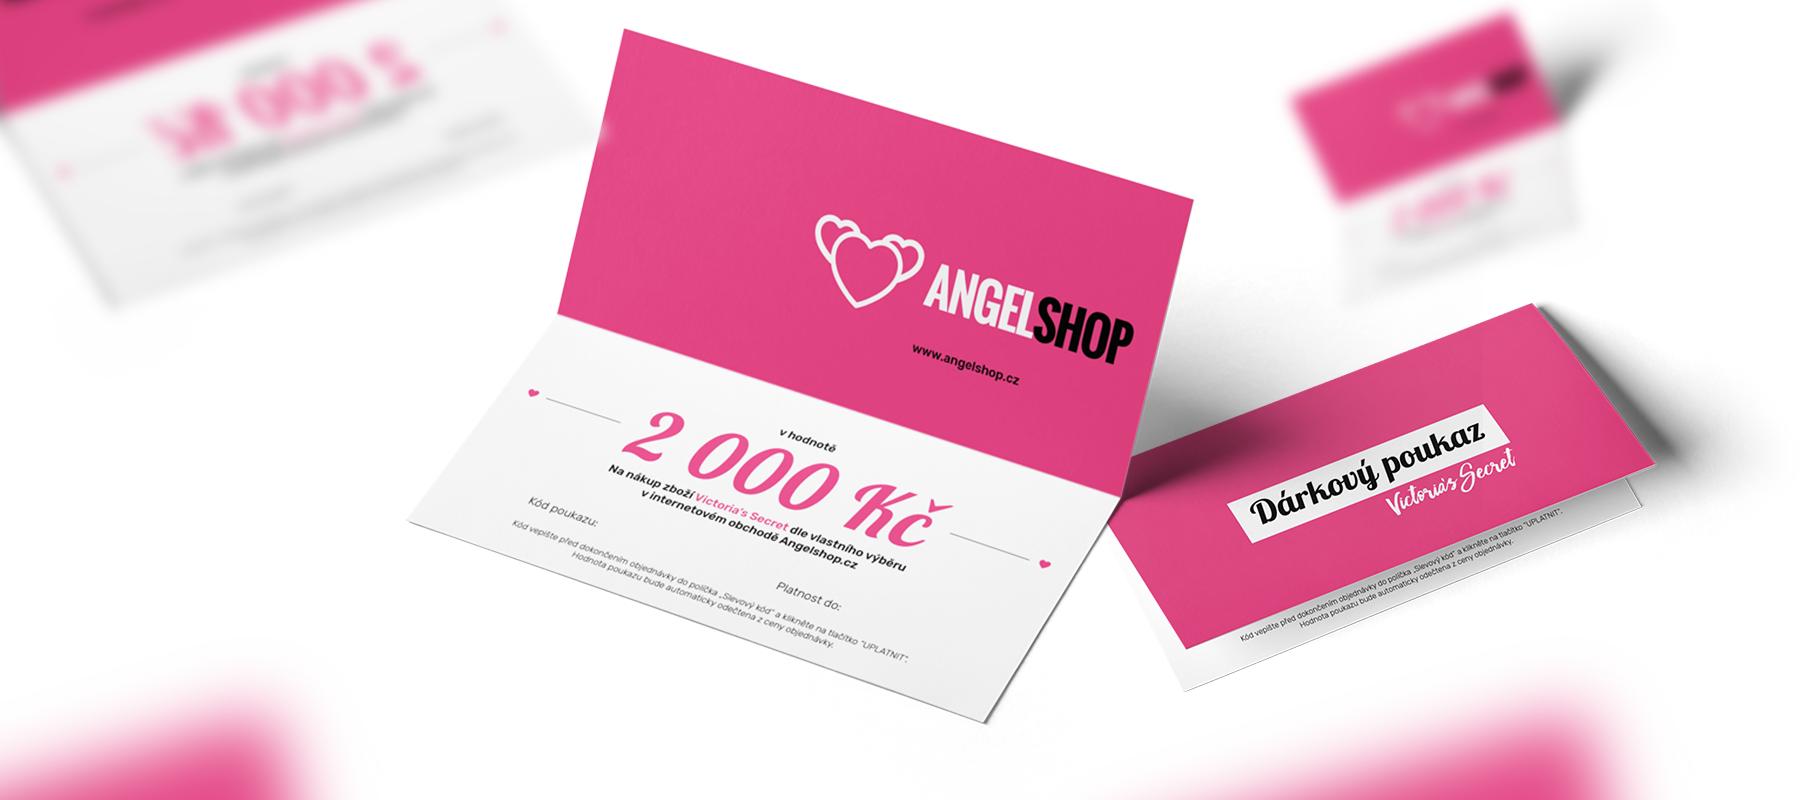 Angelshop.cz  dedb11ed5a